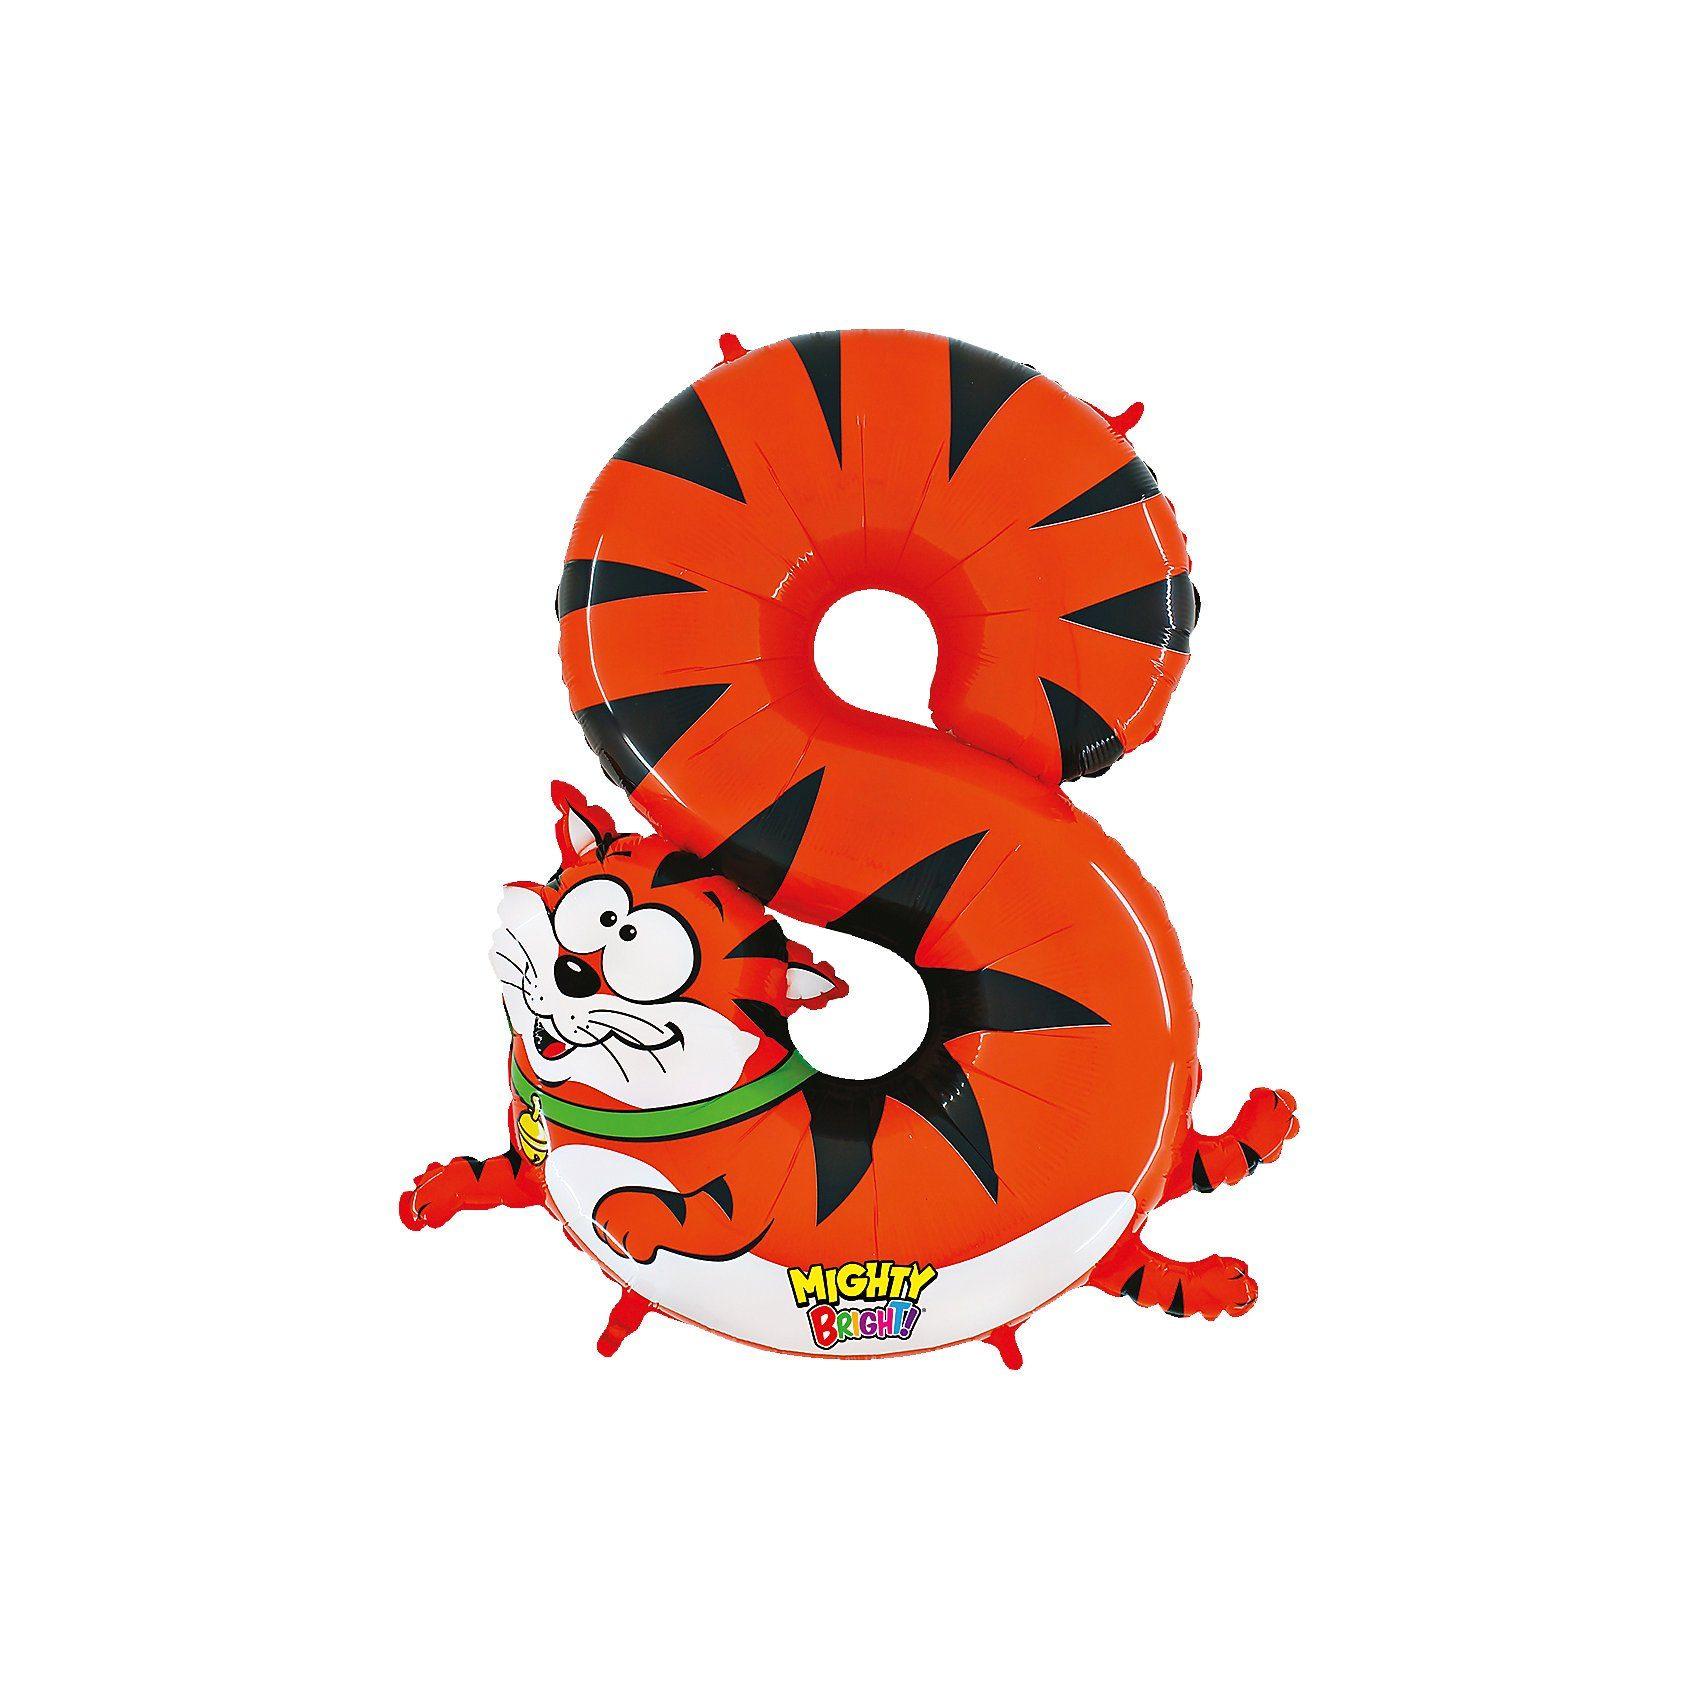 Karaloon Ballon Zahl 8 Katze